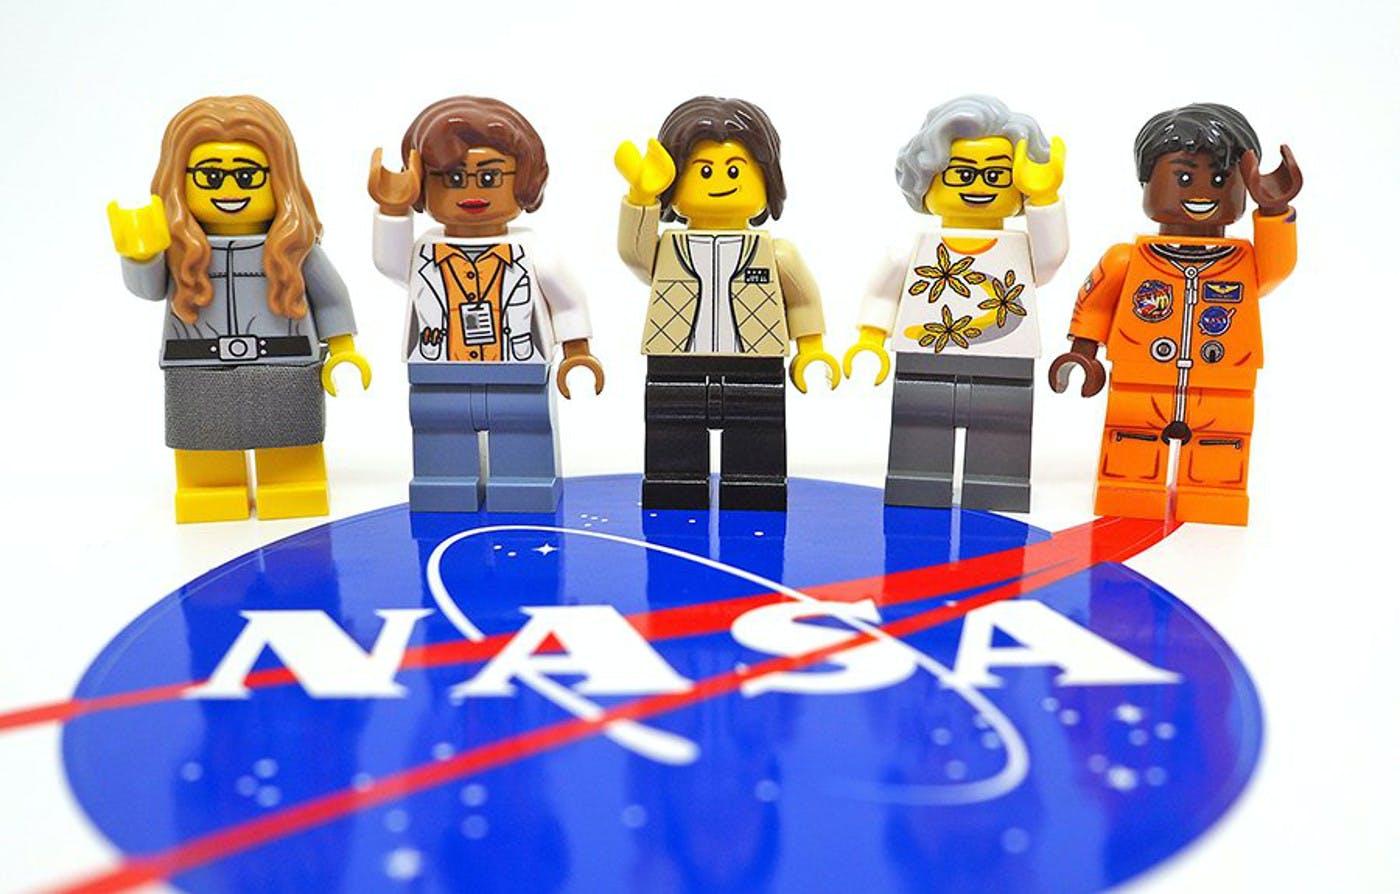 Five LEGO figures standing on the NASA logo.